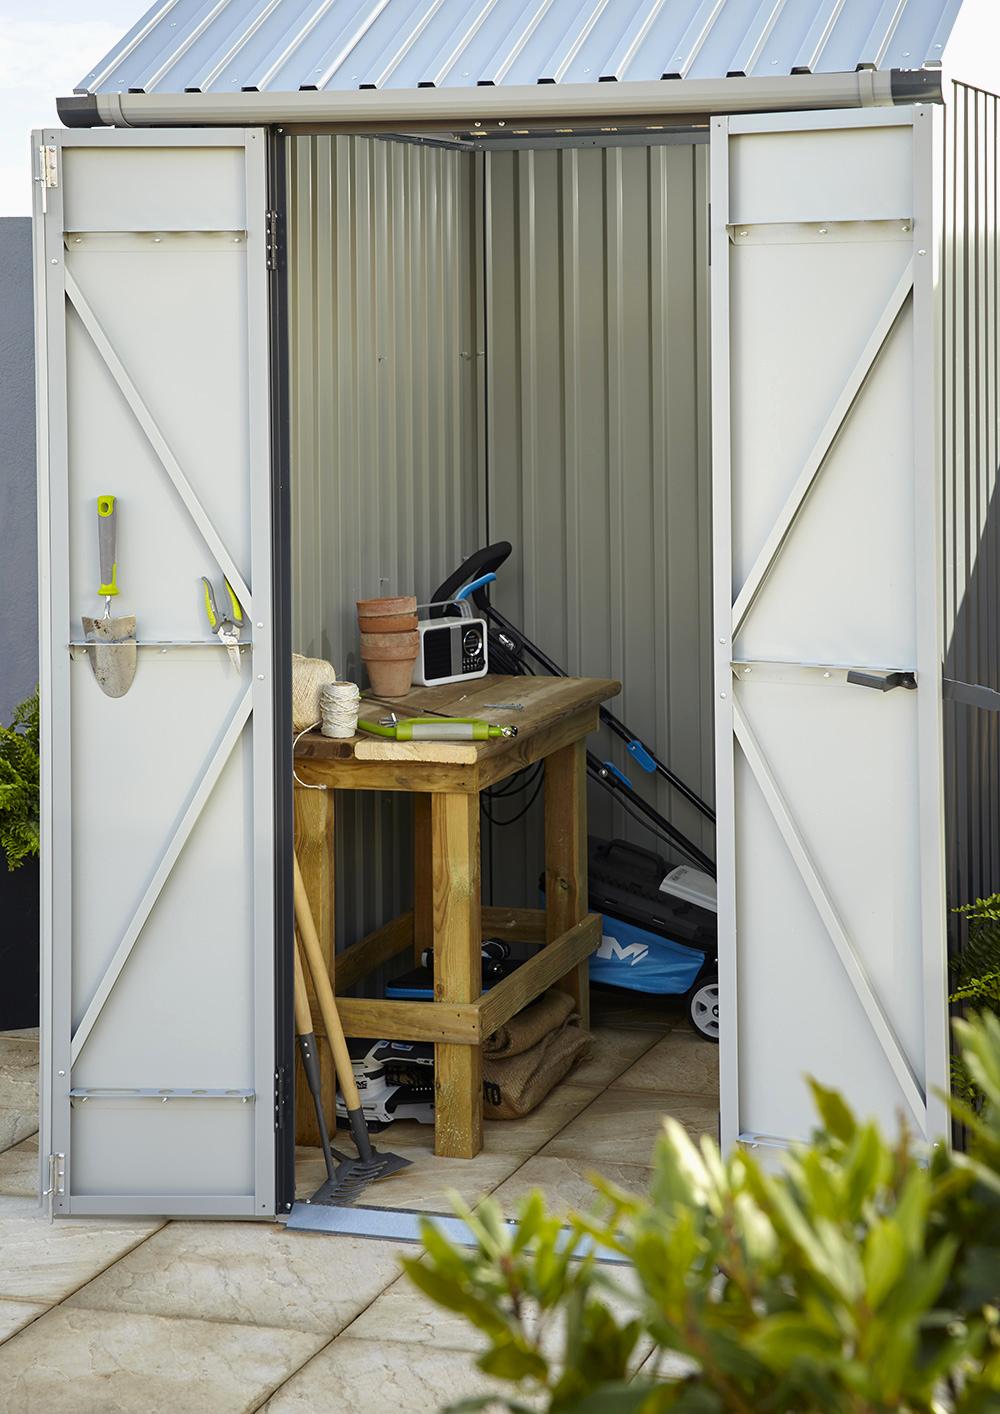 Abri De Jardin Permis De Construire Nouveau Abri De Jardin Boite A Outils Idées Abris Castorama Dossier